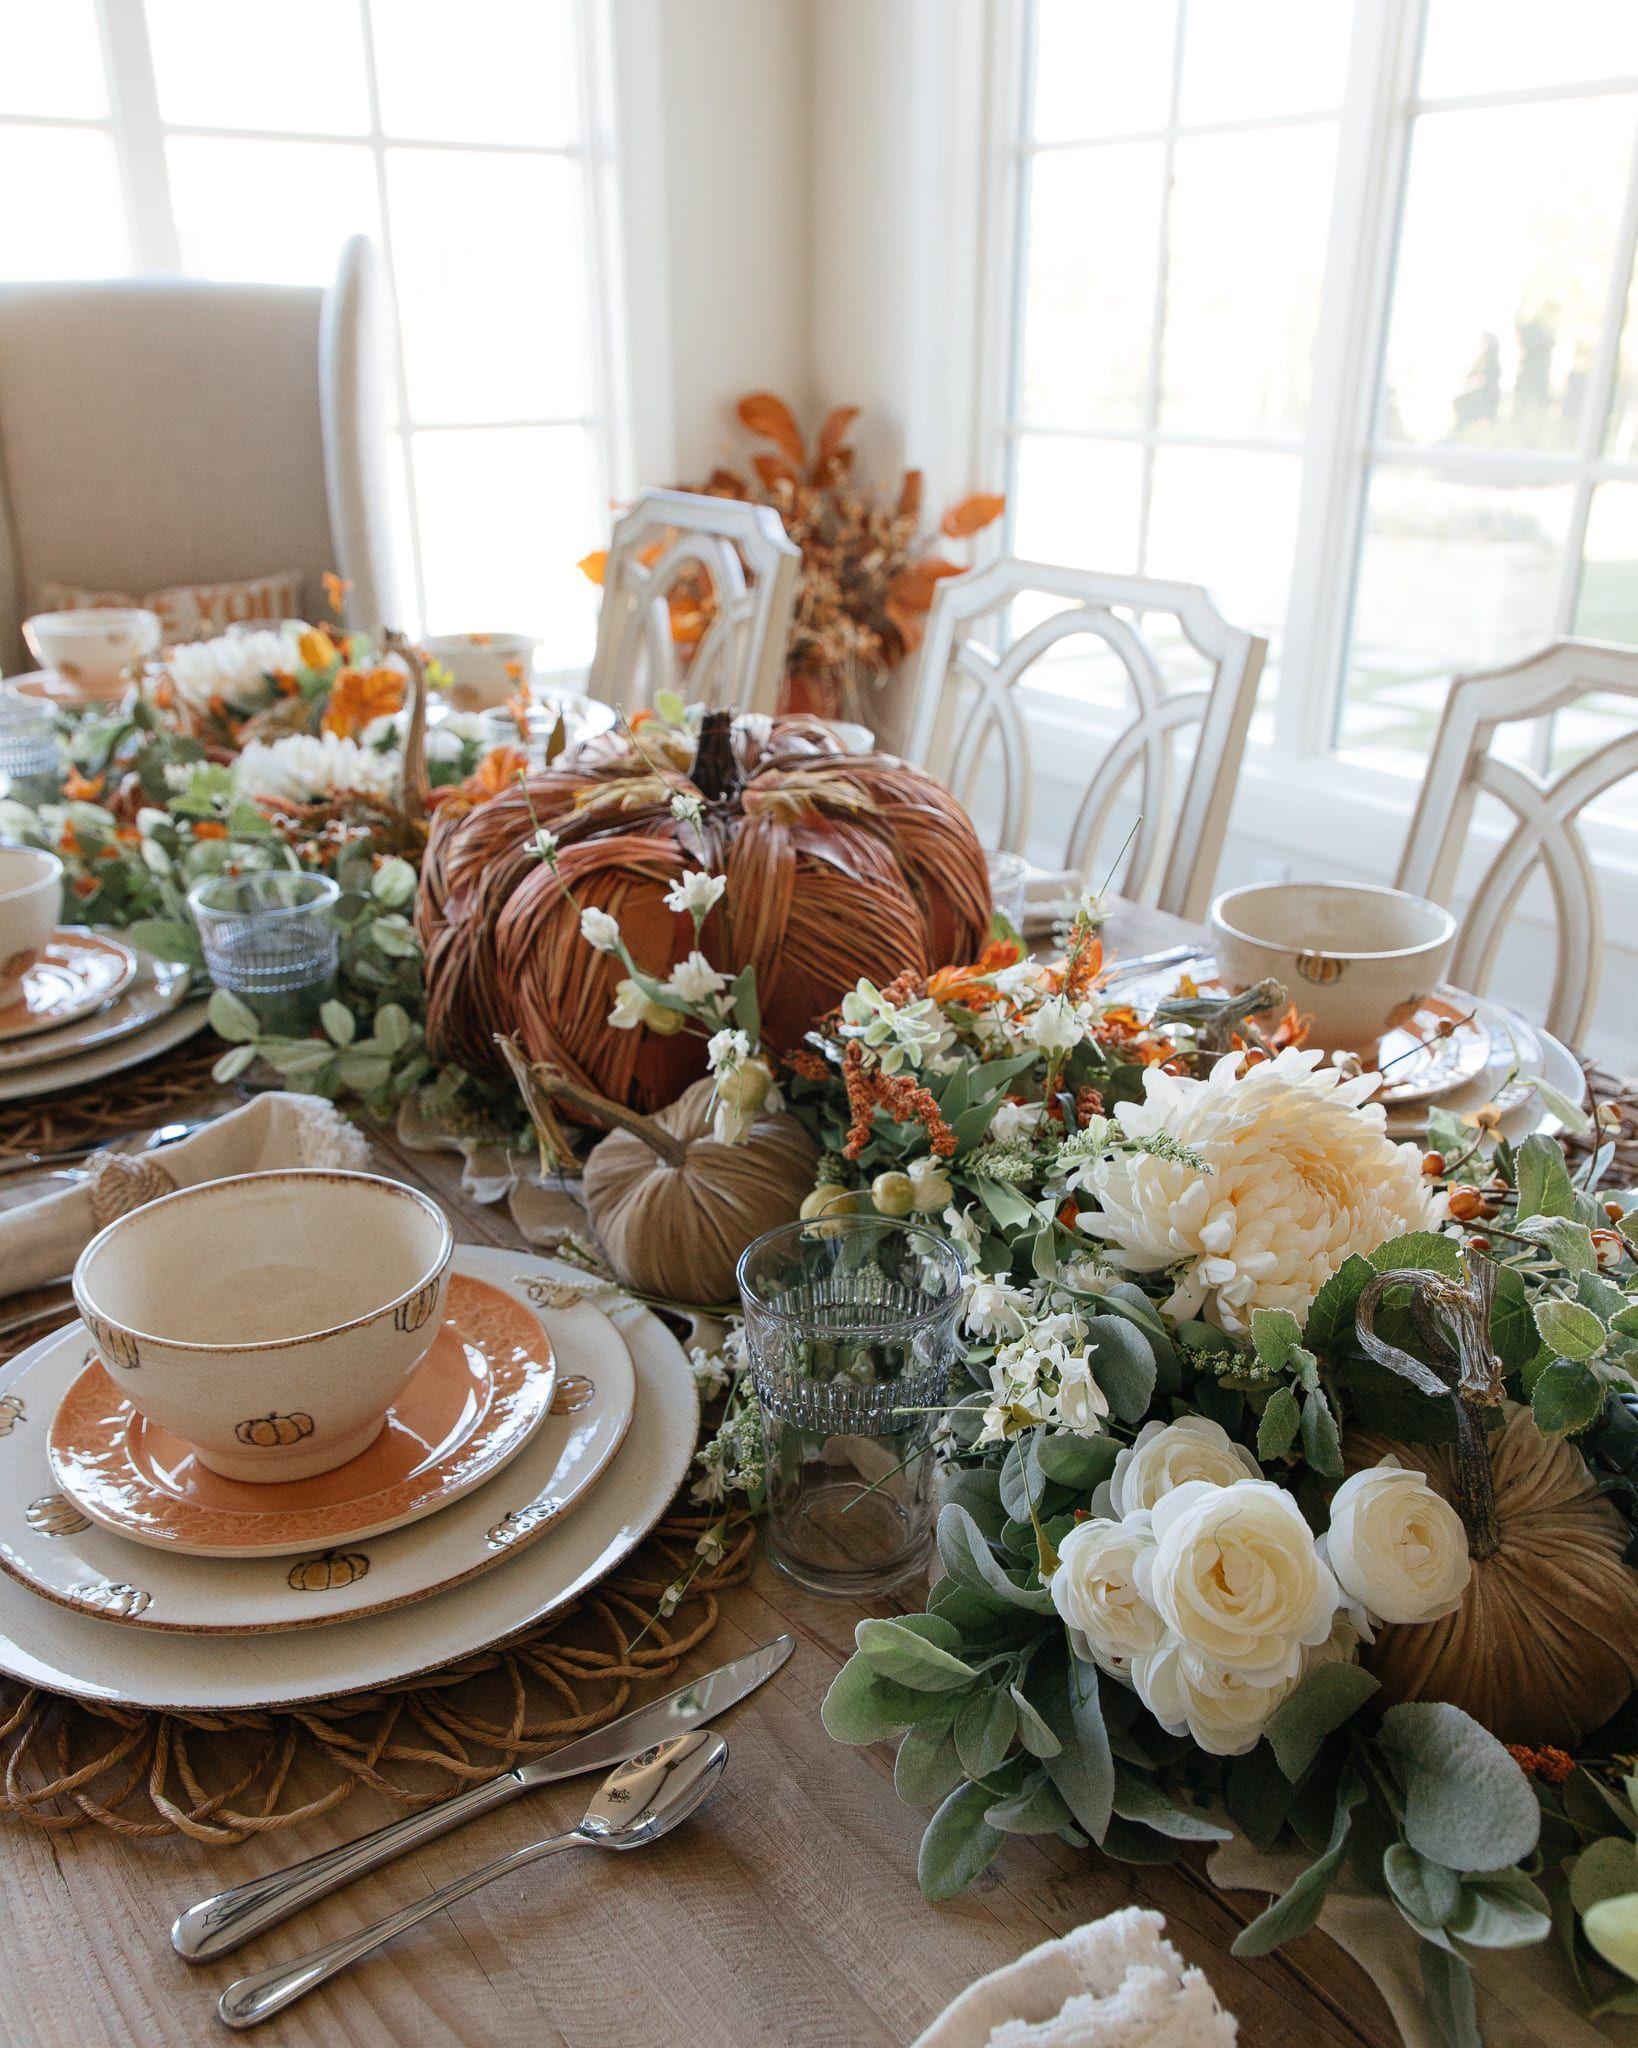 30 Halloween Centerpieces & Table Decorations DIY Ideas